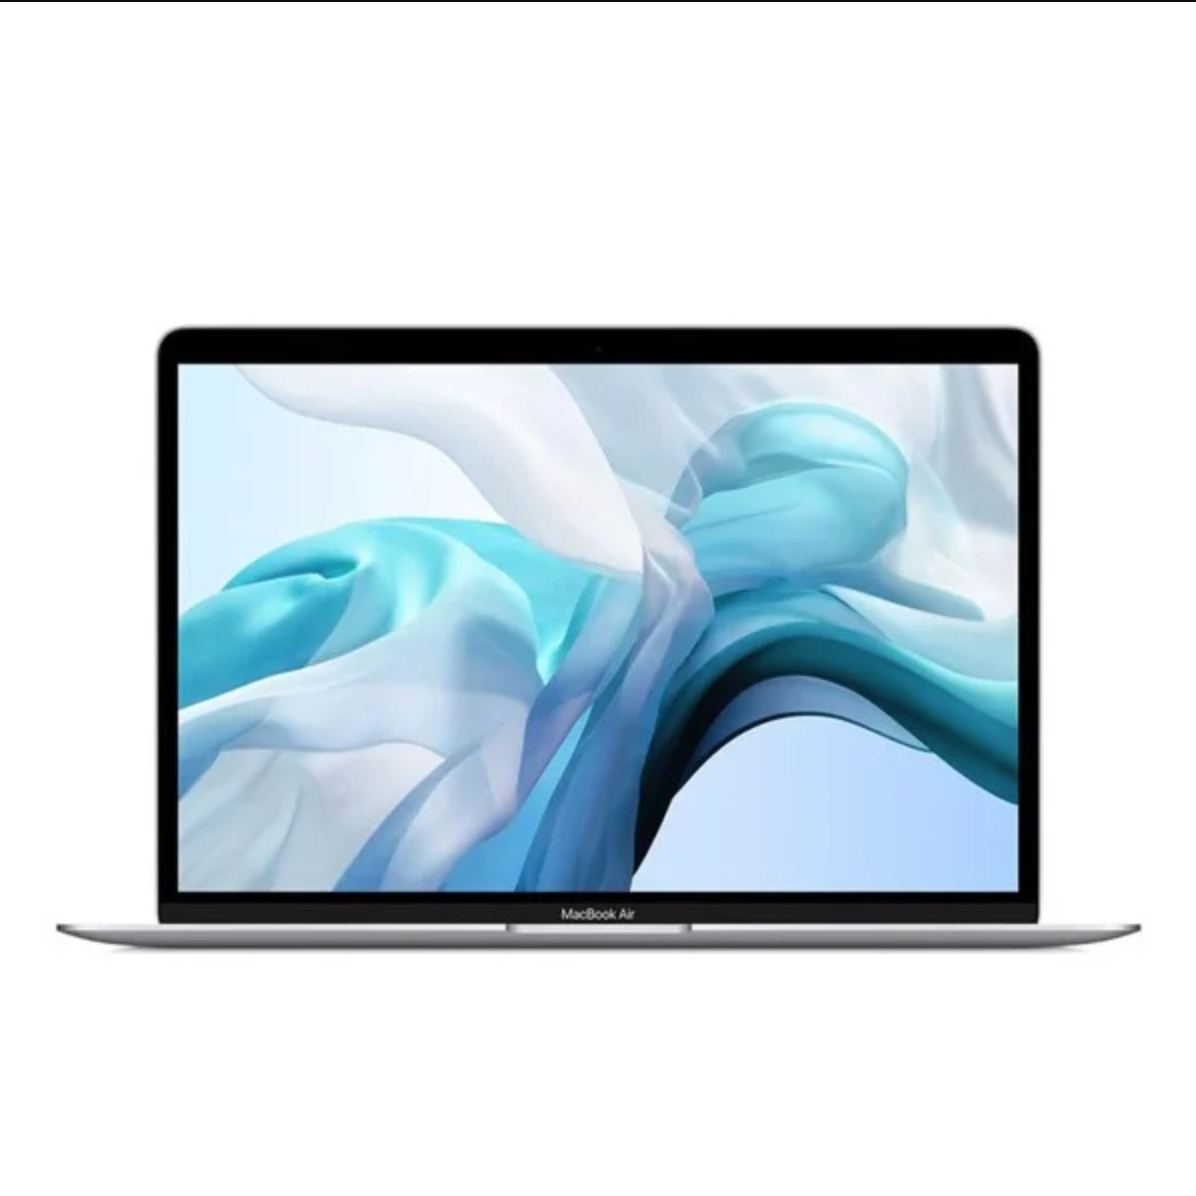 MacBook Air 2020 Silver 512GB (MWH42)